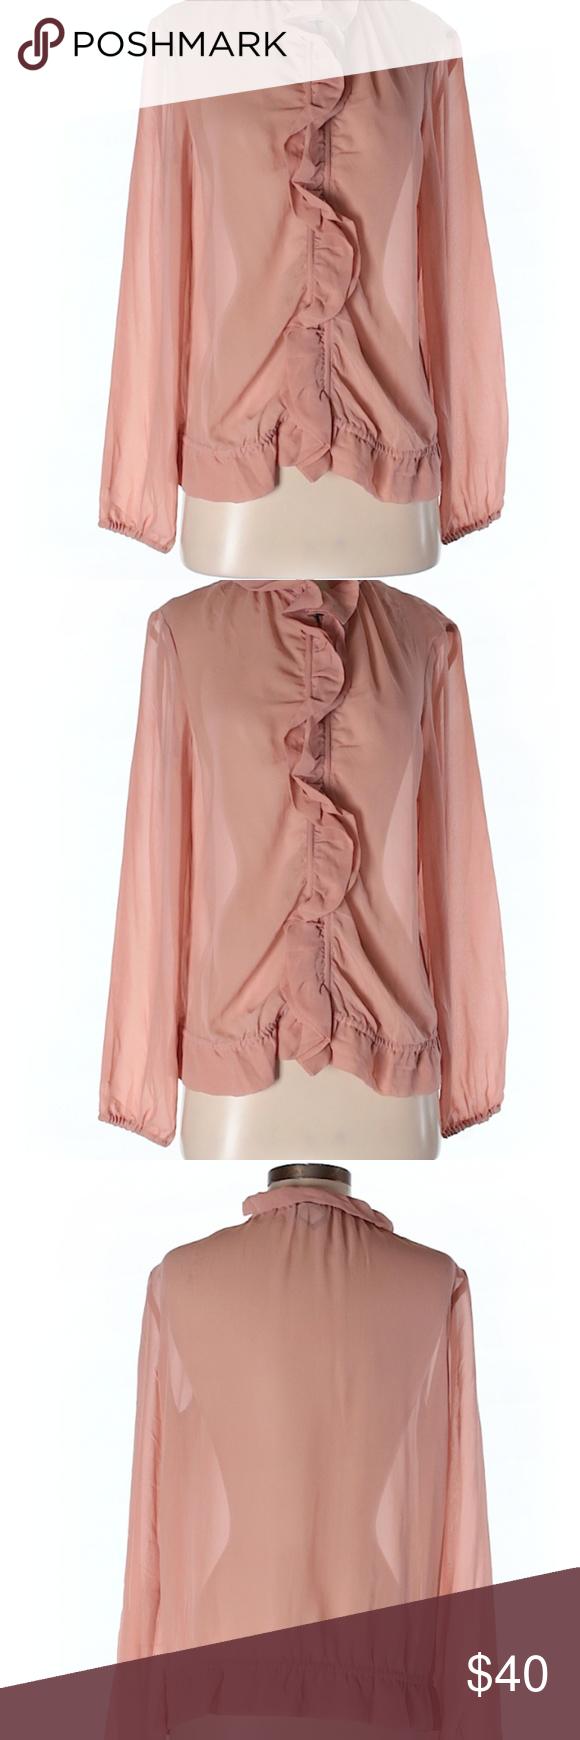 d10b70ca9dc78 Moda International Silk Top Ping Ruffle Size S Like New. Long sleeve